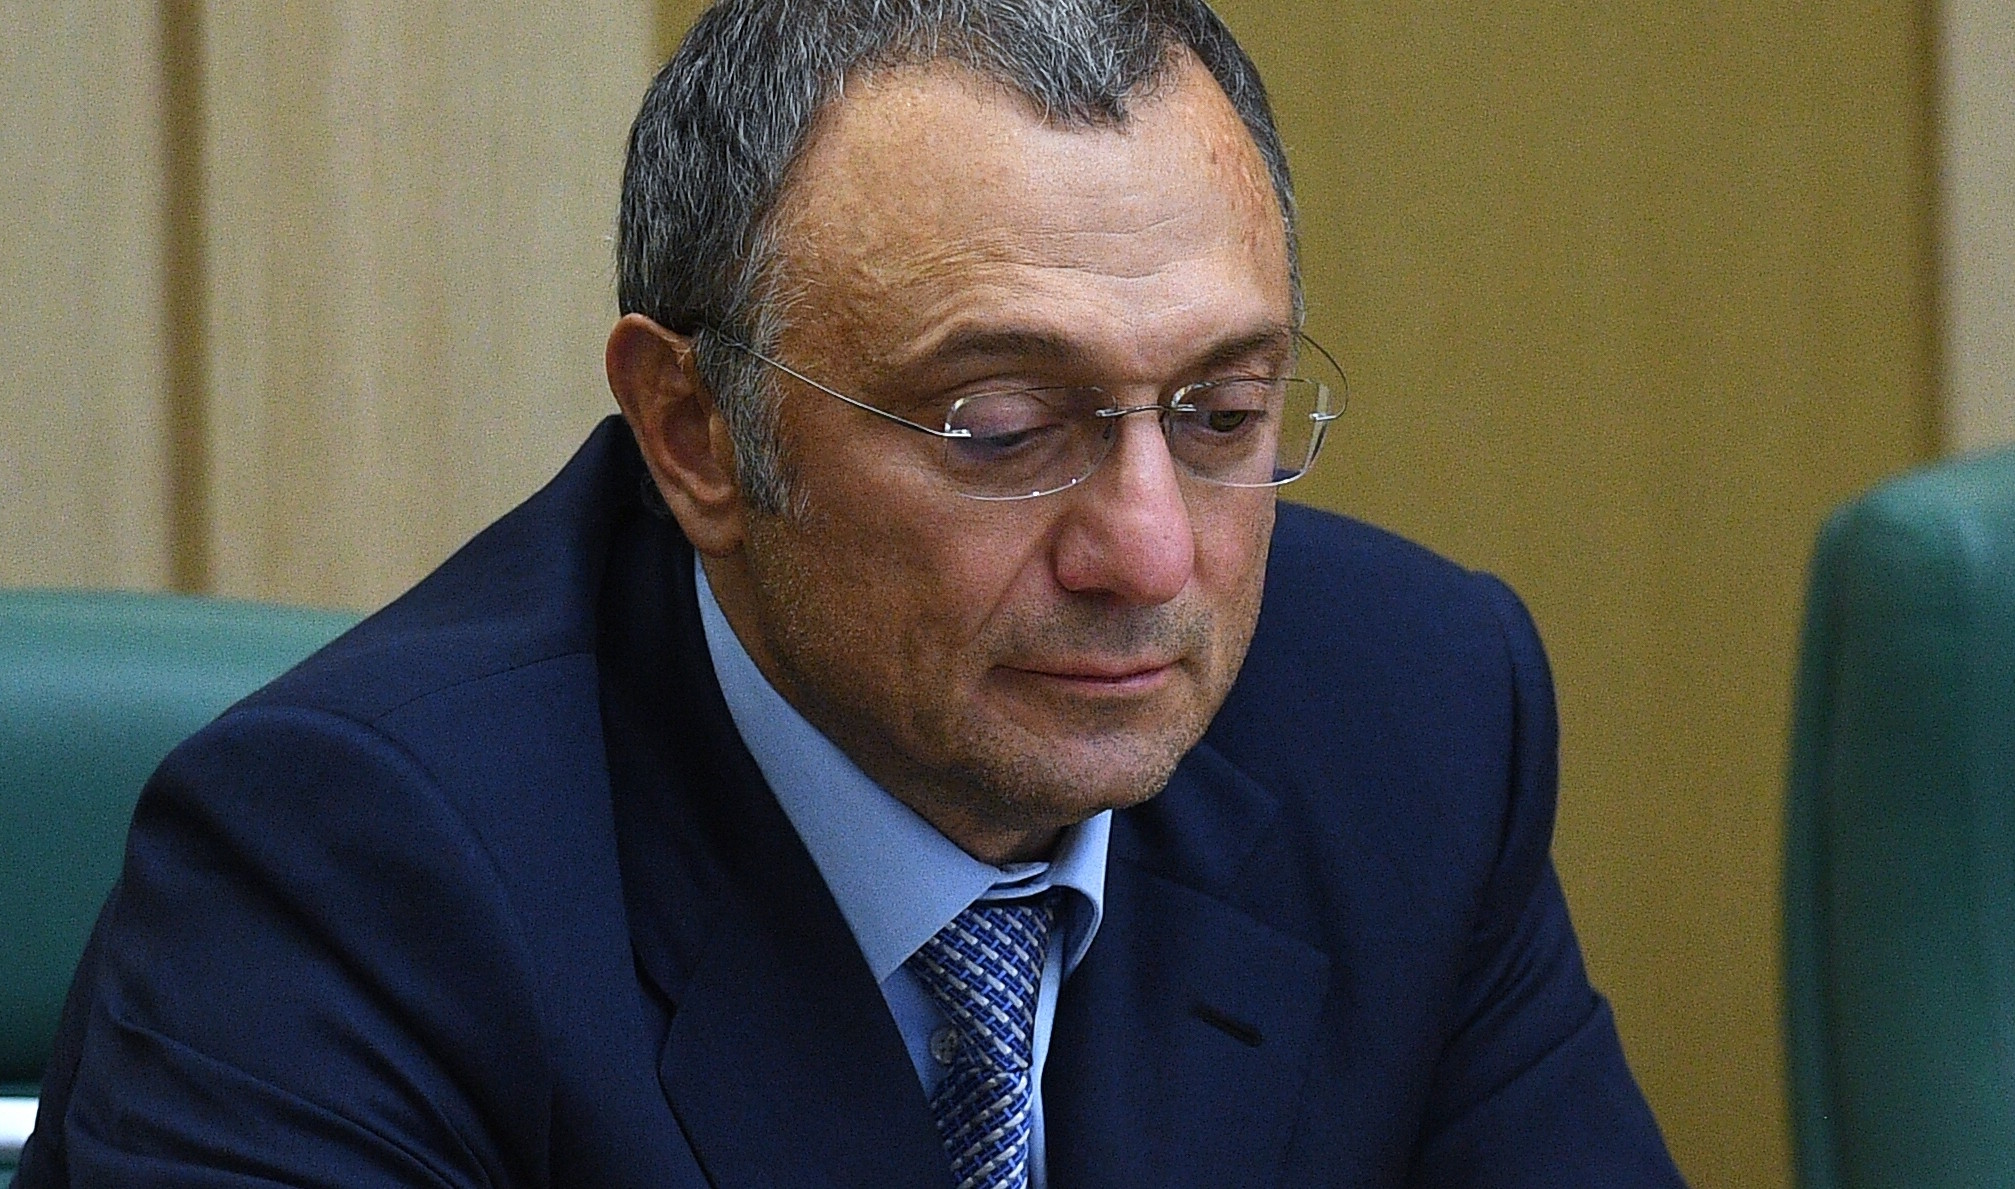 <p>Сулейман Керимов. Фото: &copy; РИА Новости/Владимир Астапкович</p>